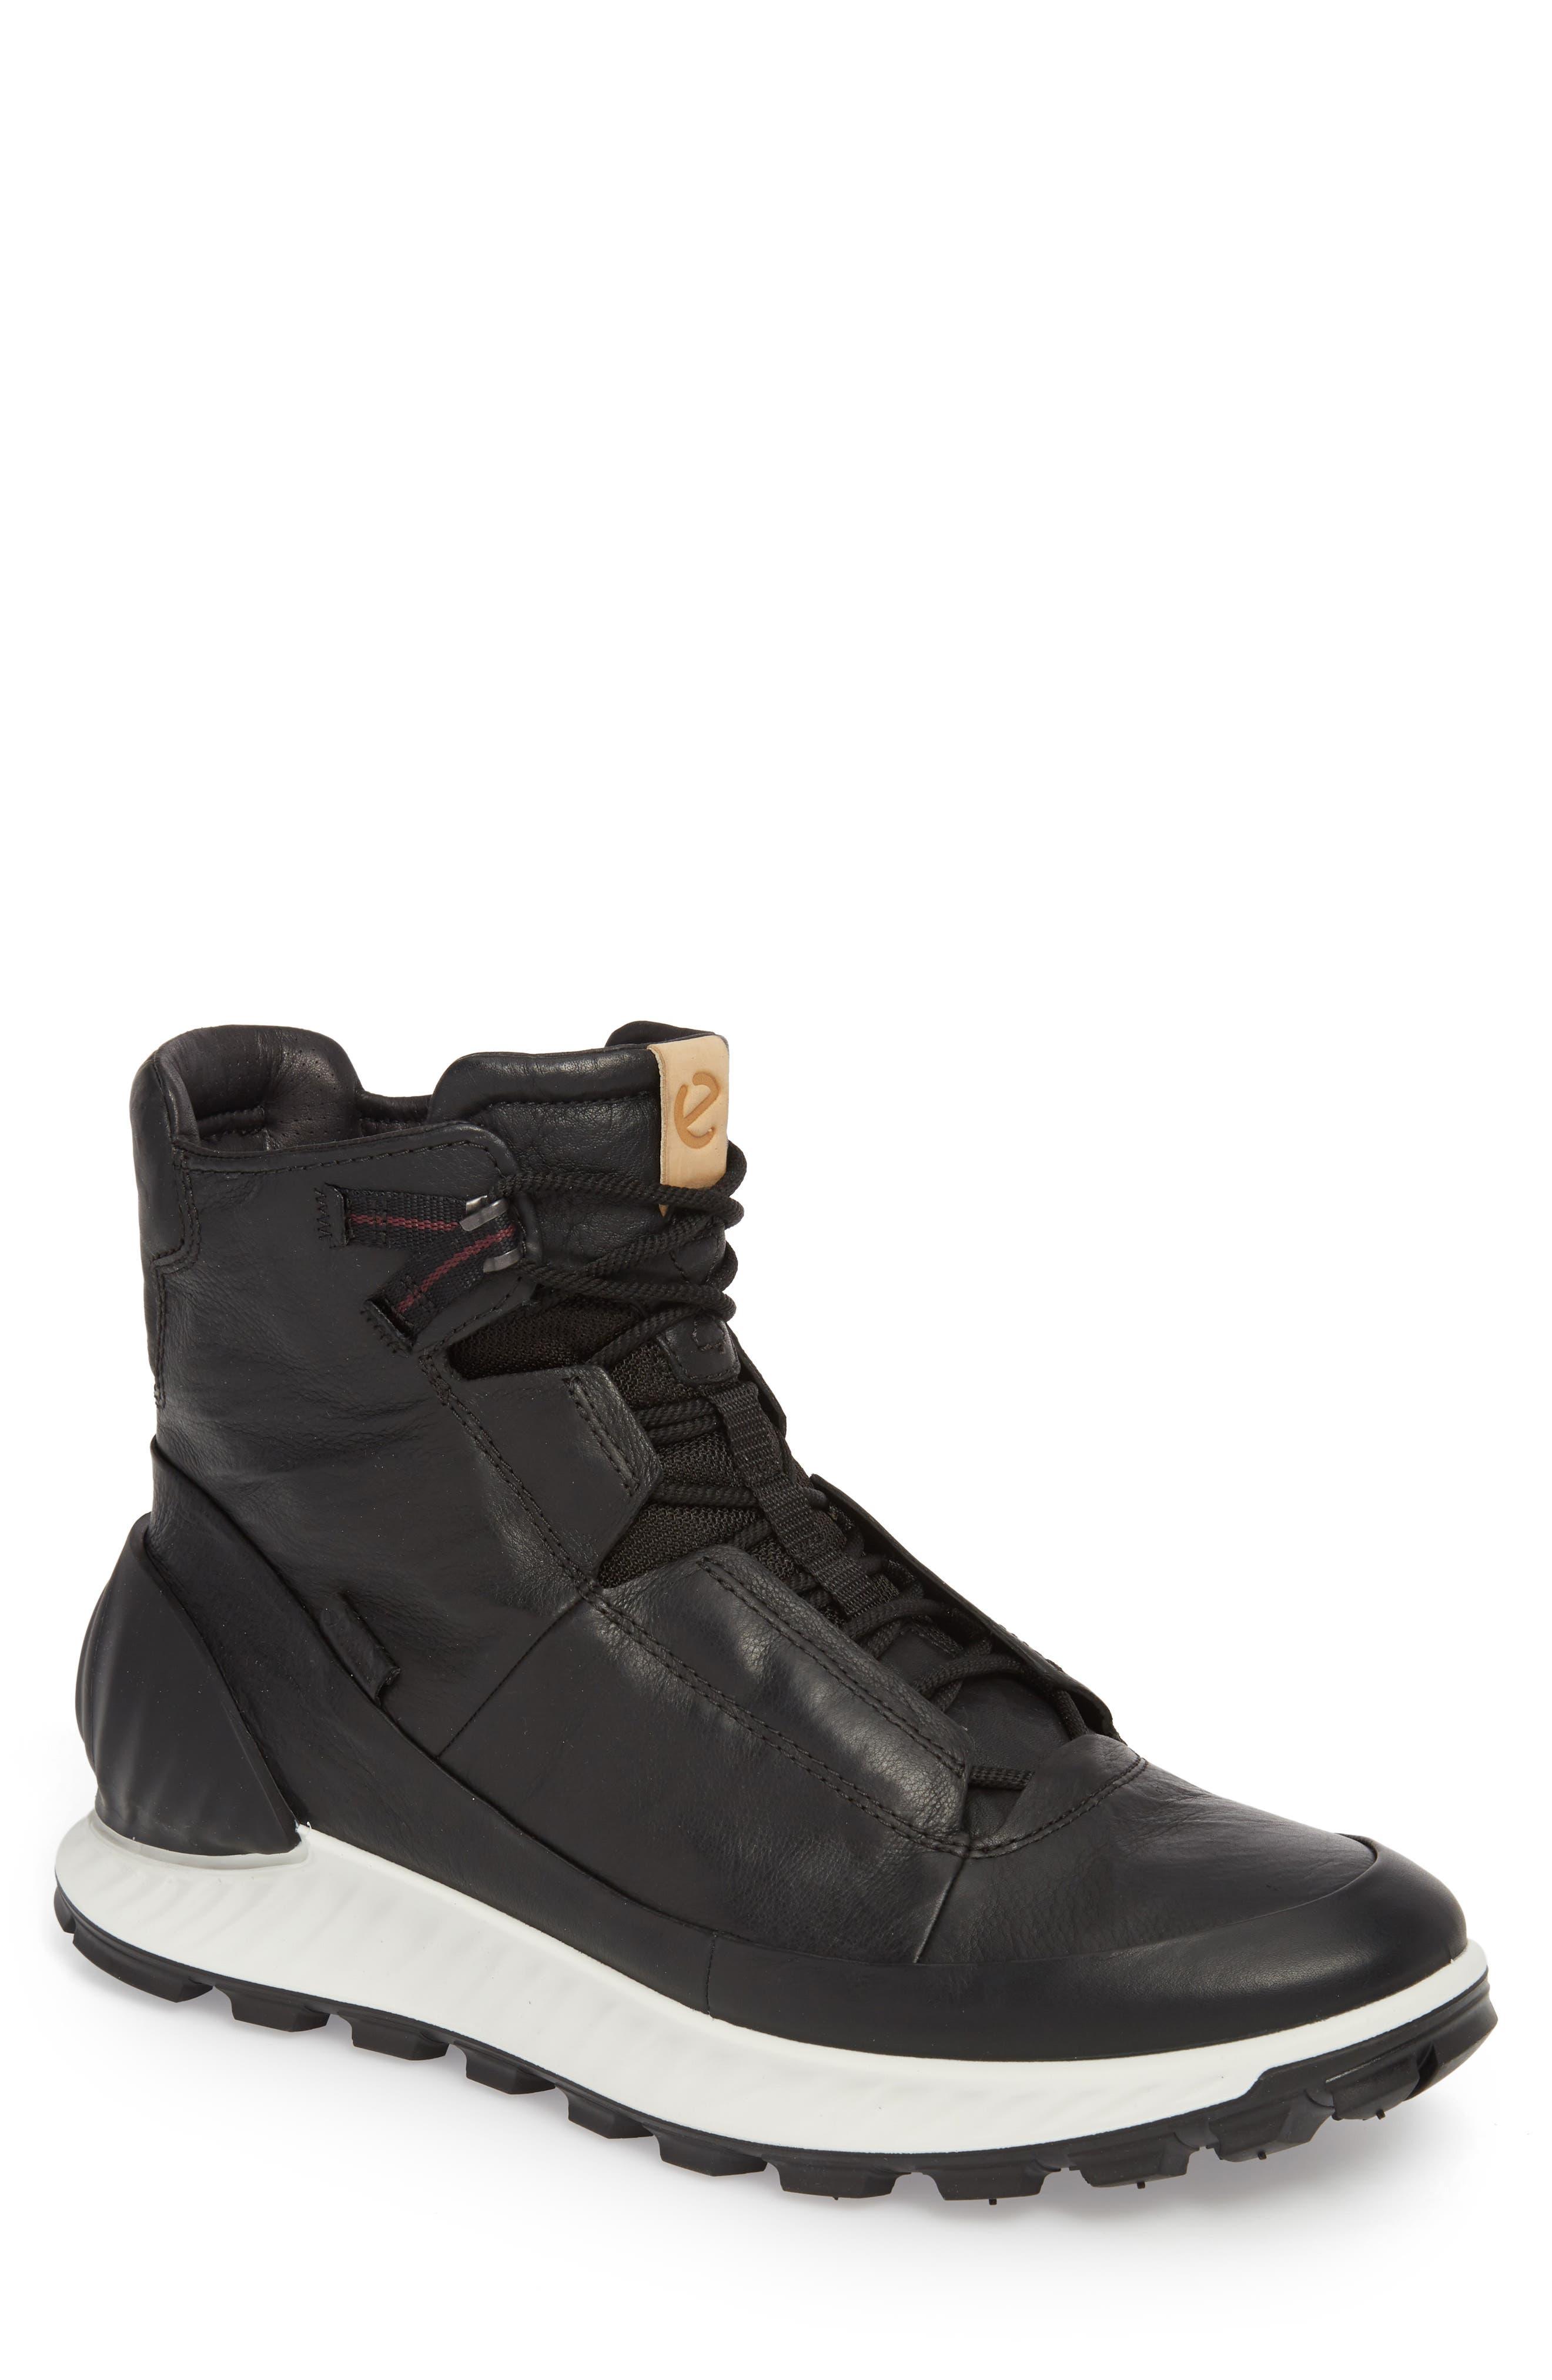 ecco shoes on sale mens